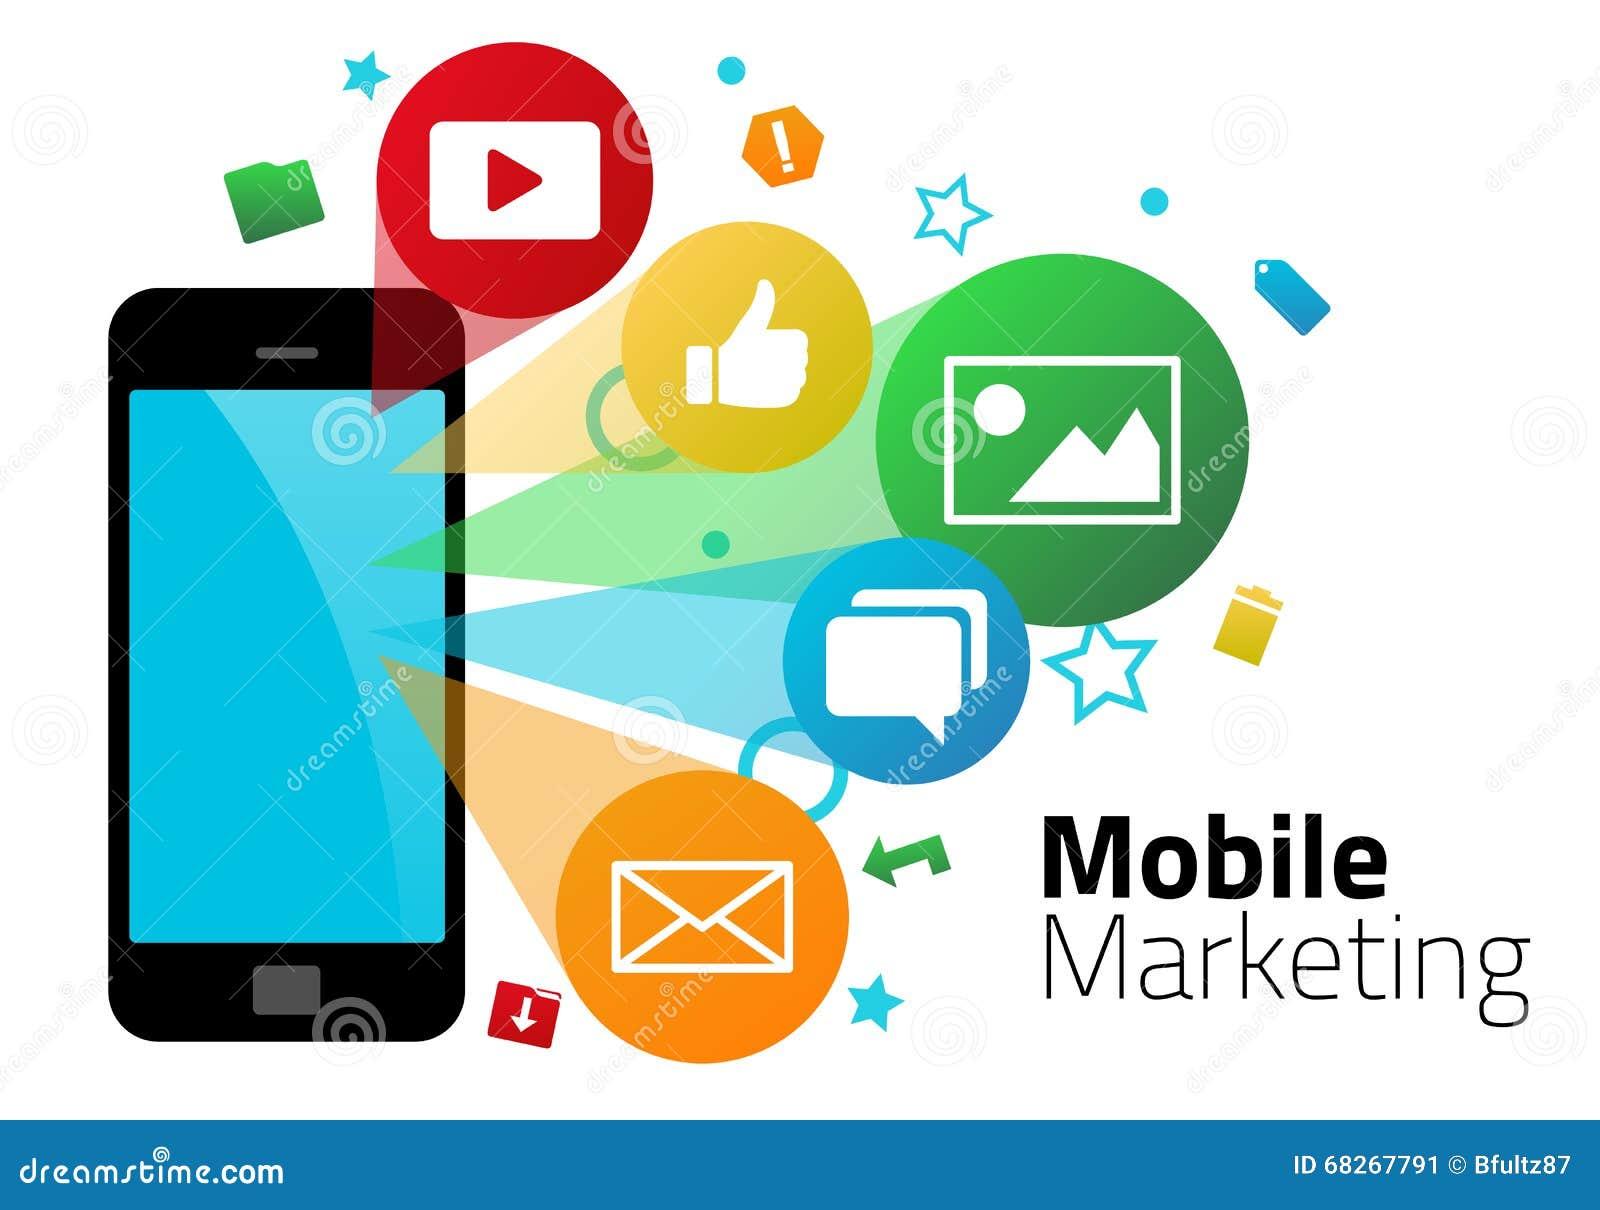 mobile-marketing-graphics-text-smartphone-illustrated-social-media-apps-68267791.jpg